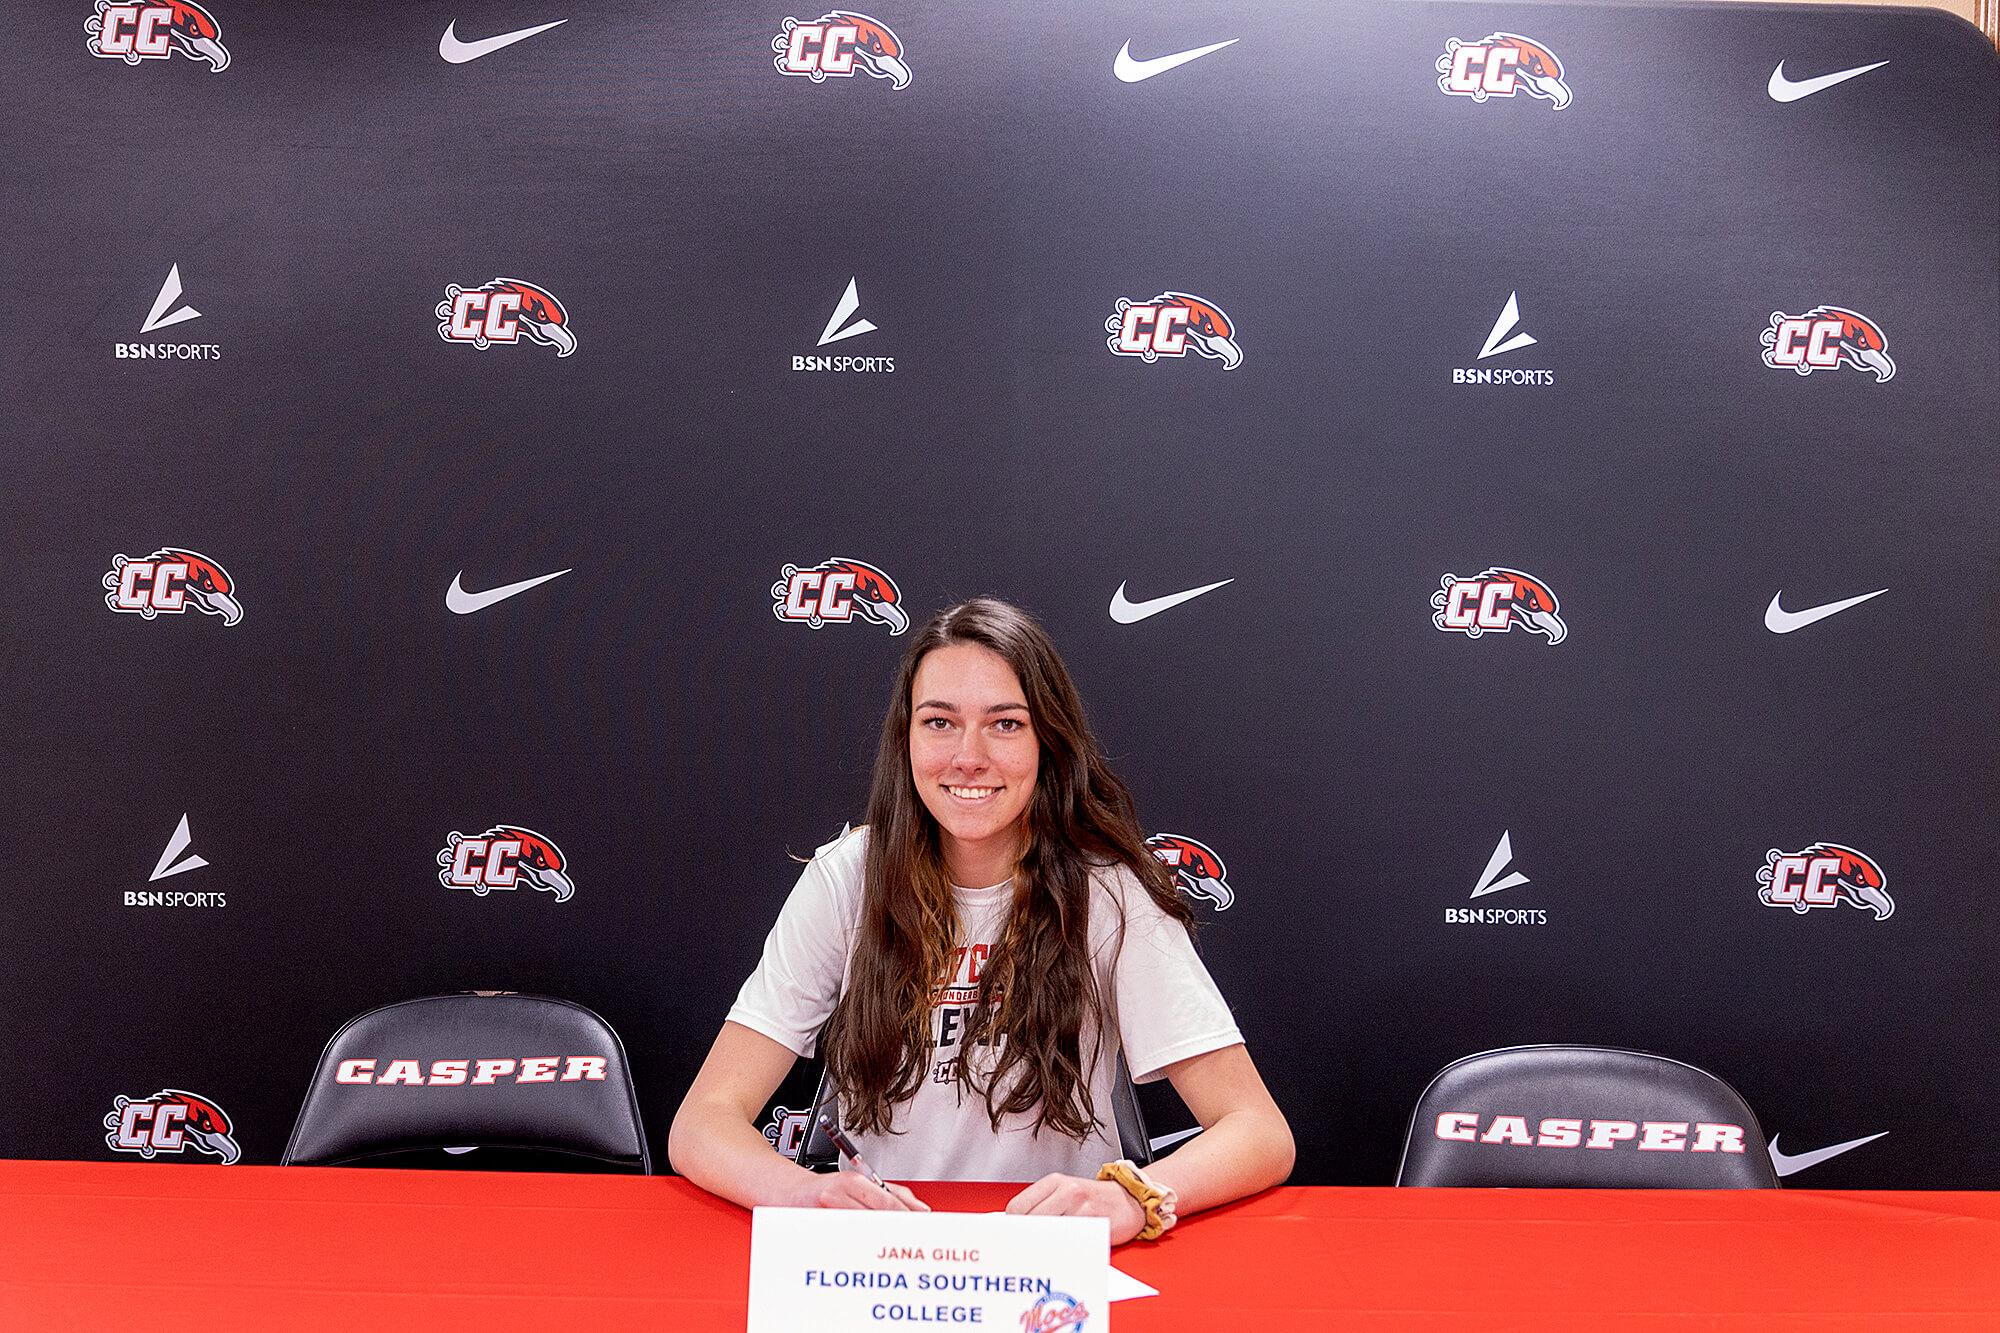 Photo of Casper College Volleyball team member Jana Gilic.